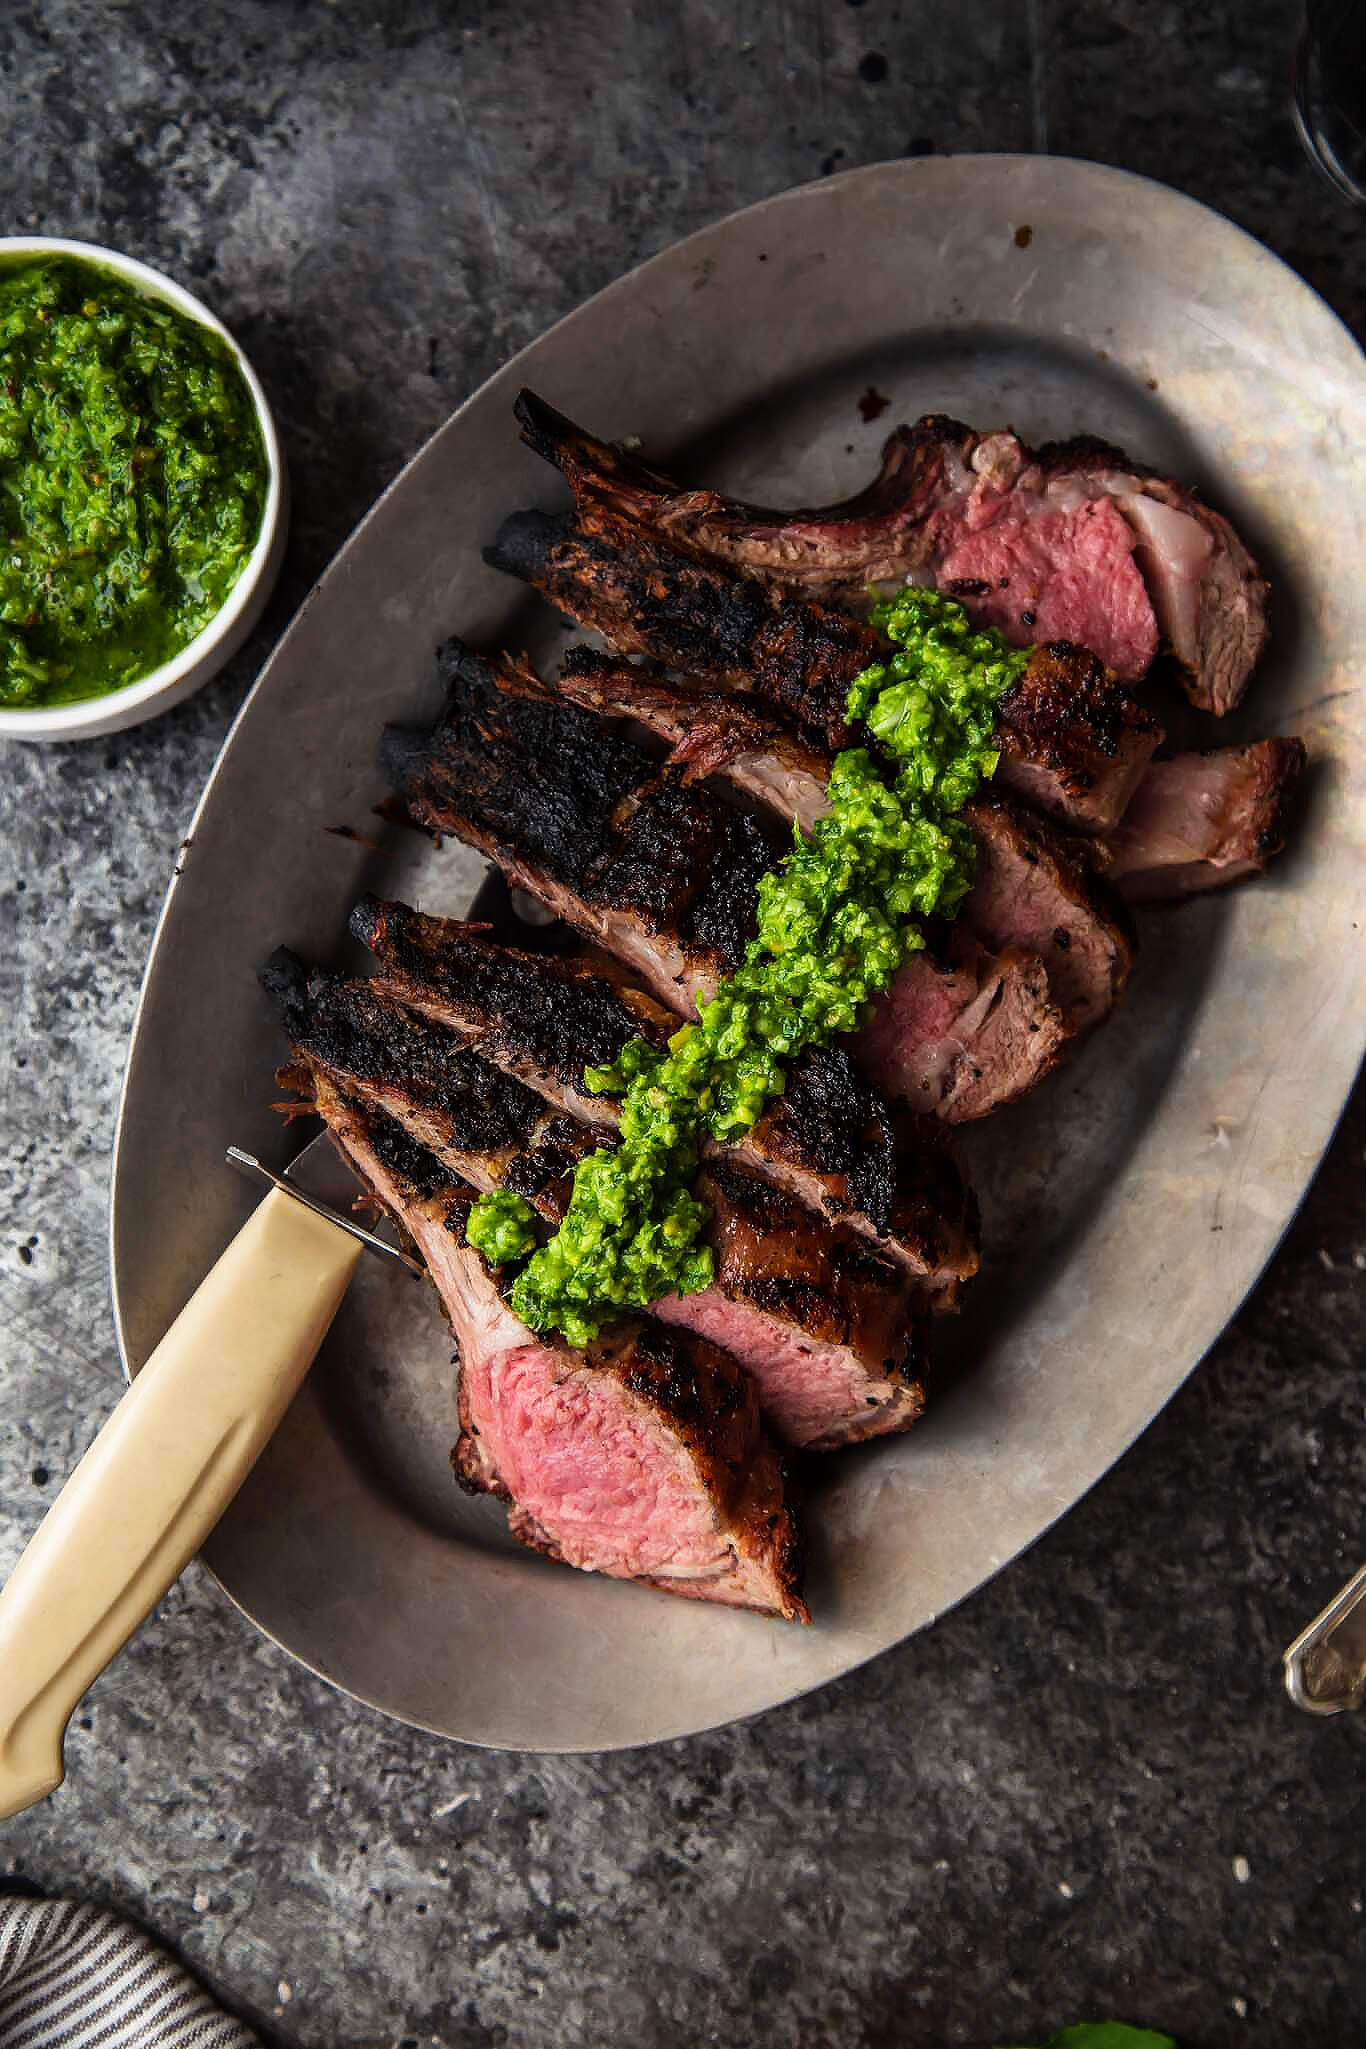 Grilled Rack of Lamb with Pistachio Basil Pesto will upgrade your next BBQ or tailgate. Frenched rack of lamb is grilled, sliced & topped with basil pesto. | platingsandpairings.com